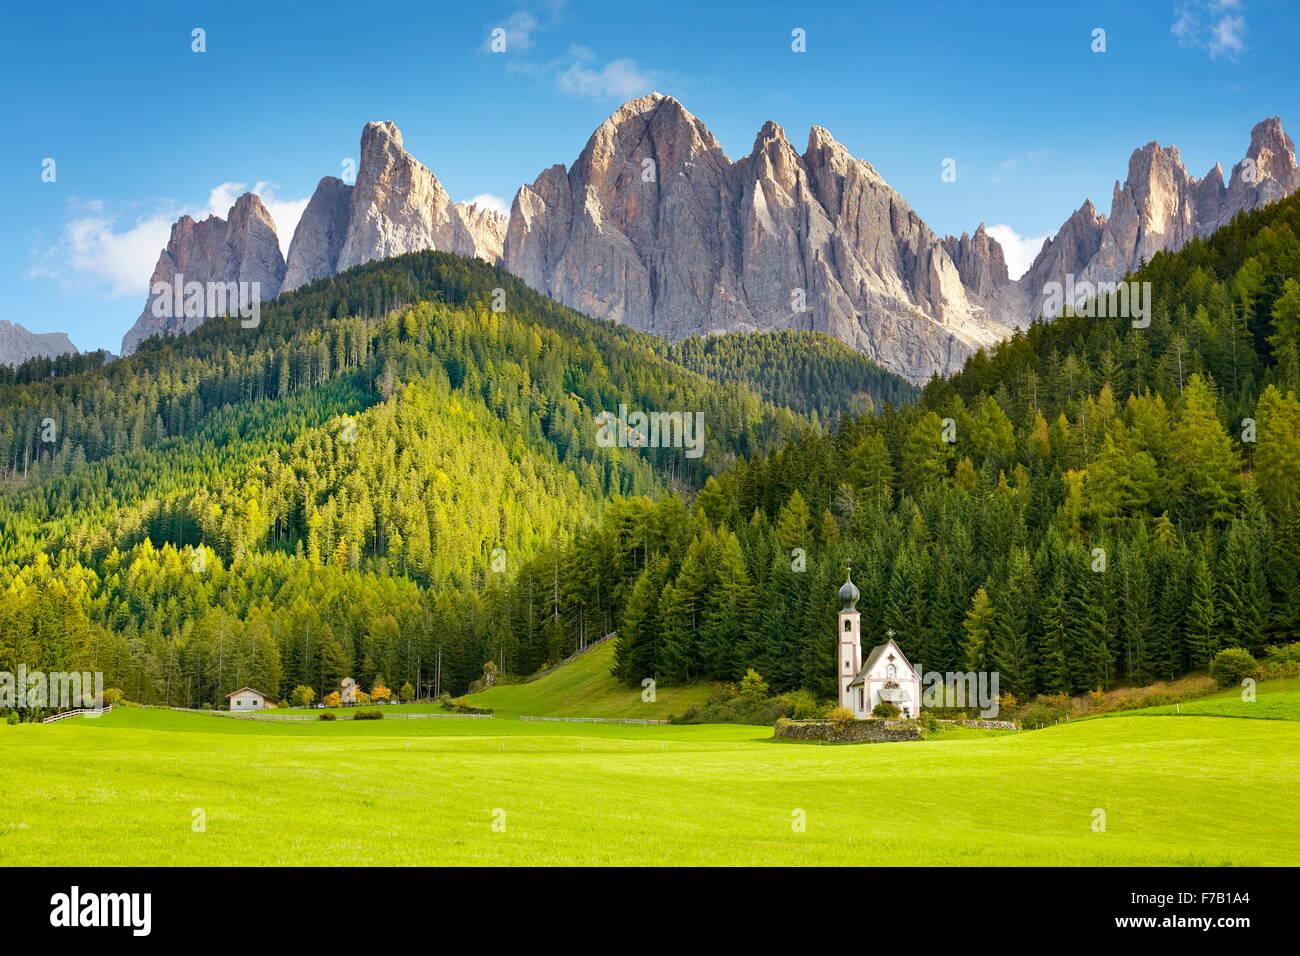 St Johann Church, Santa Maddalena, Tyrol, Dolomites Mountains landscape, Italy - Stock Image